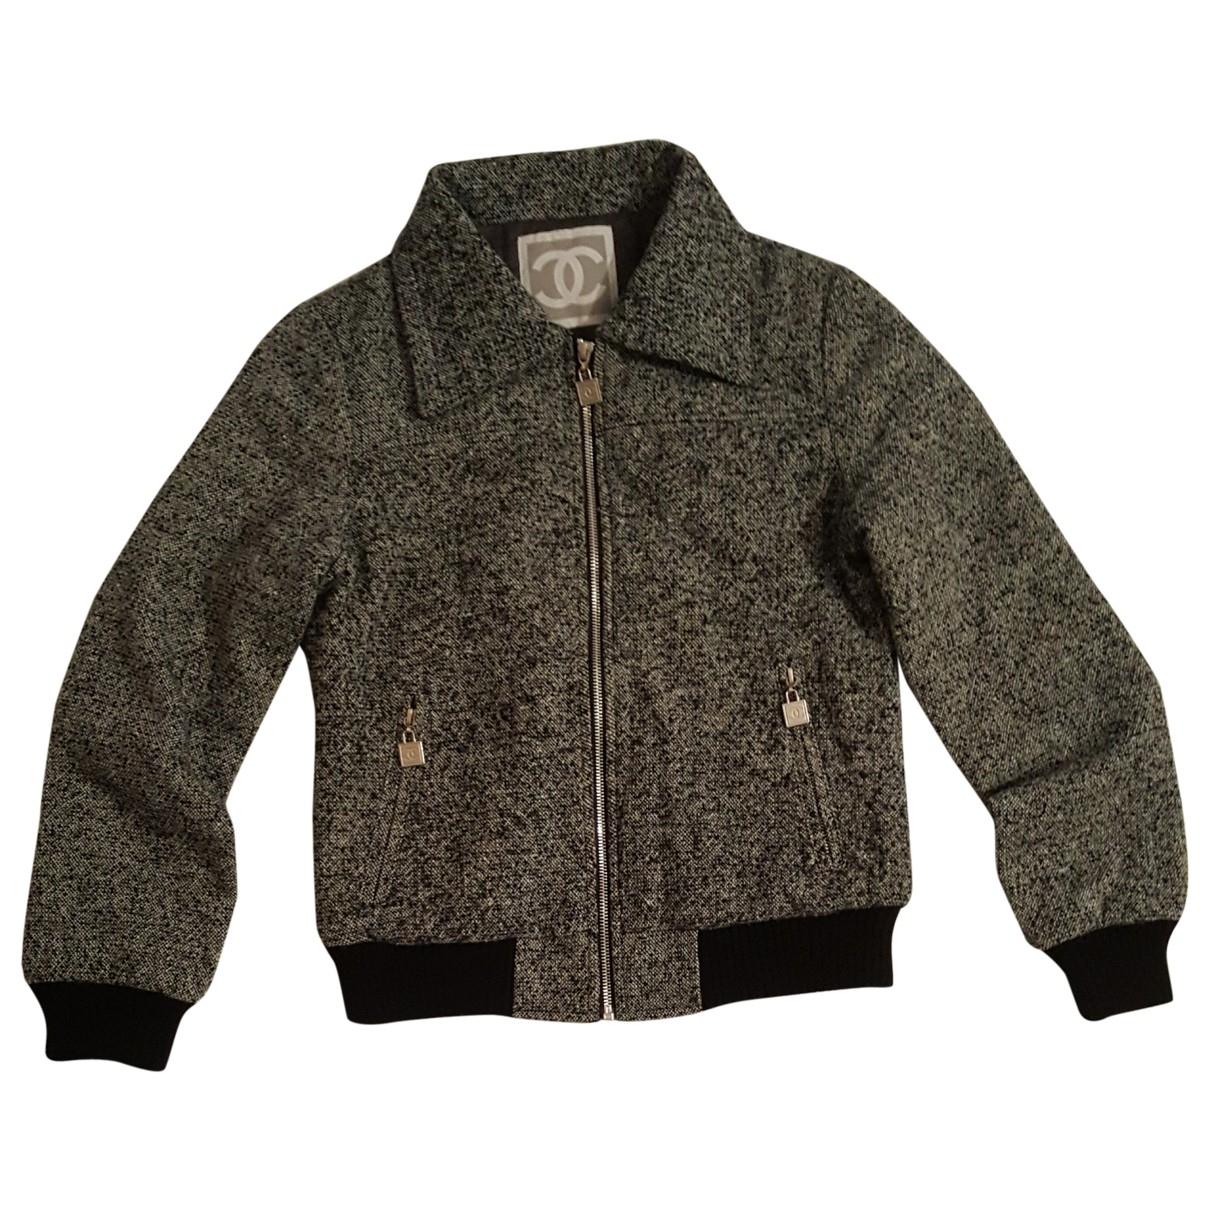 Chanel \N Jacke in  Grau Wolle